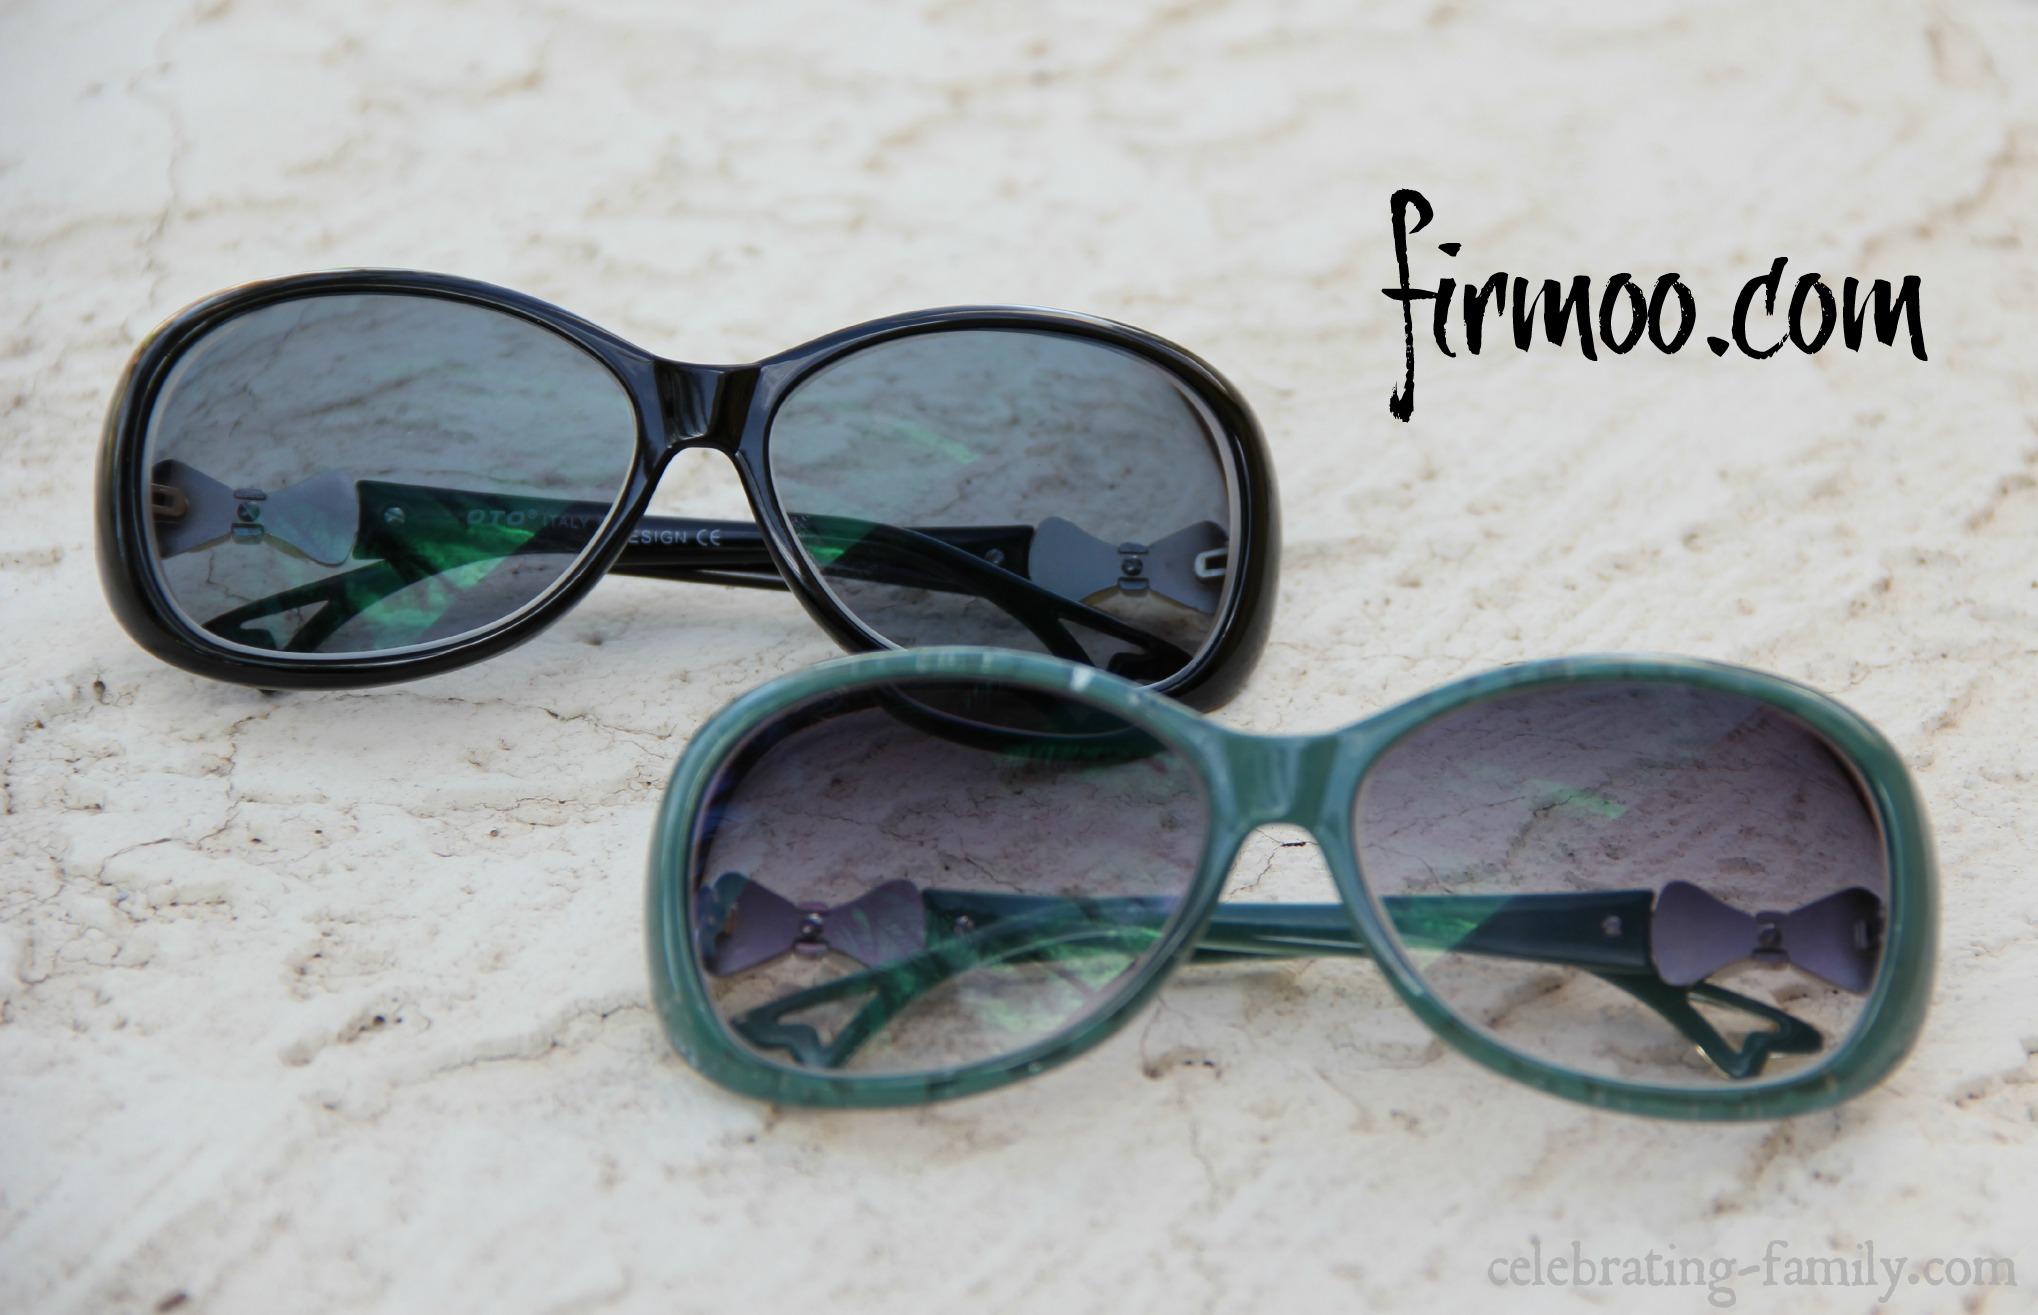 firmoo.com